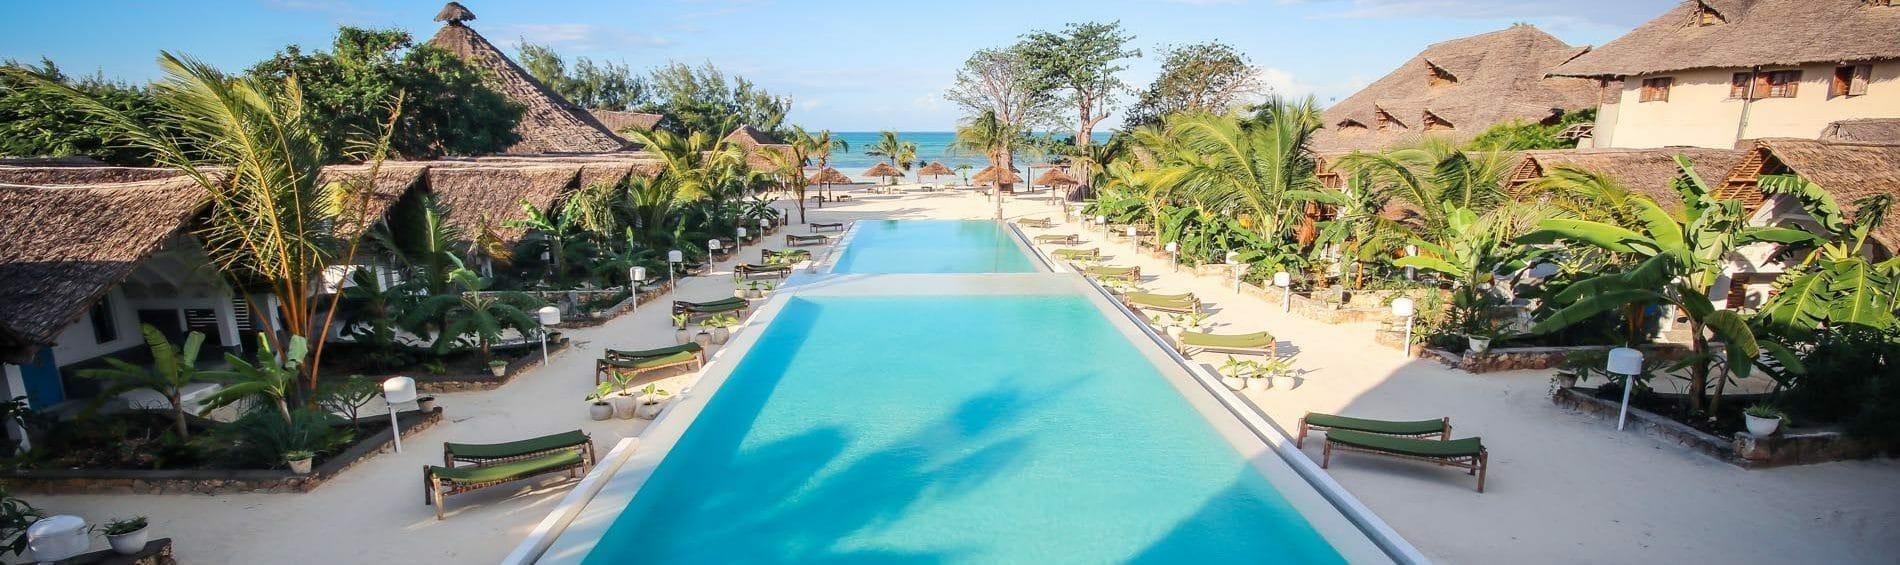 Zanzibar_FUN_Pool_Klüger Reisen